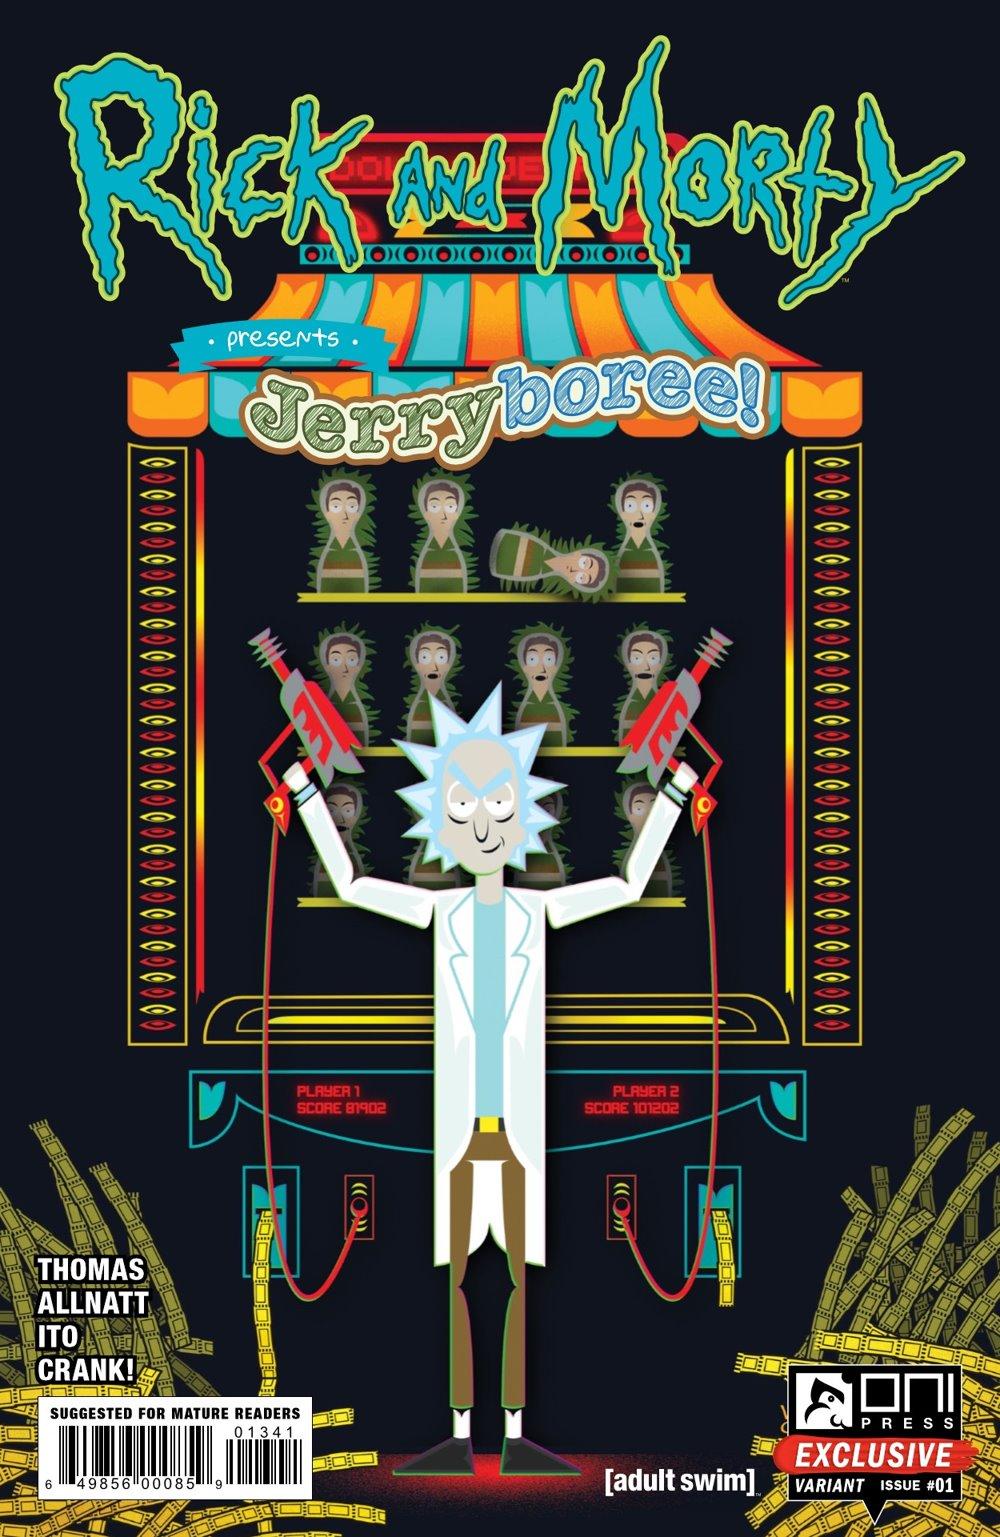 RM-PRES-JERRYBOREE-1-MARKETING-03 ComicList Previews: RICK AND MORTY PRESENTS JERRYBOREE #1